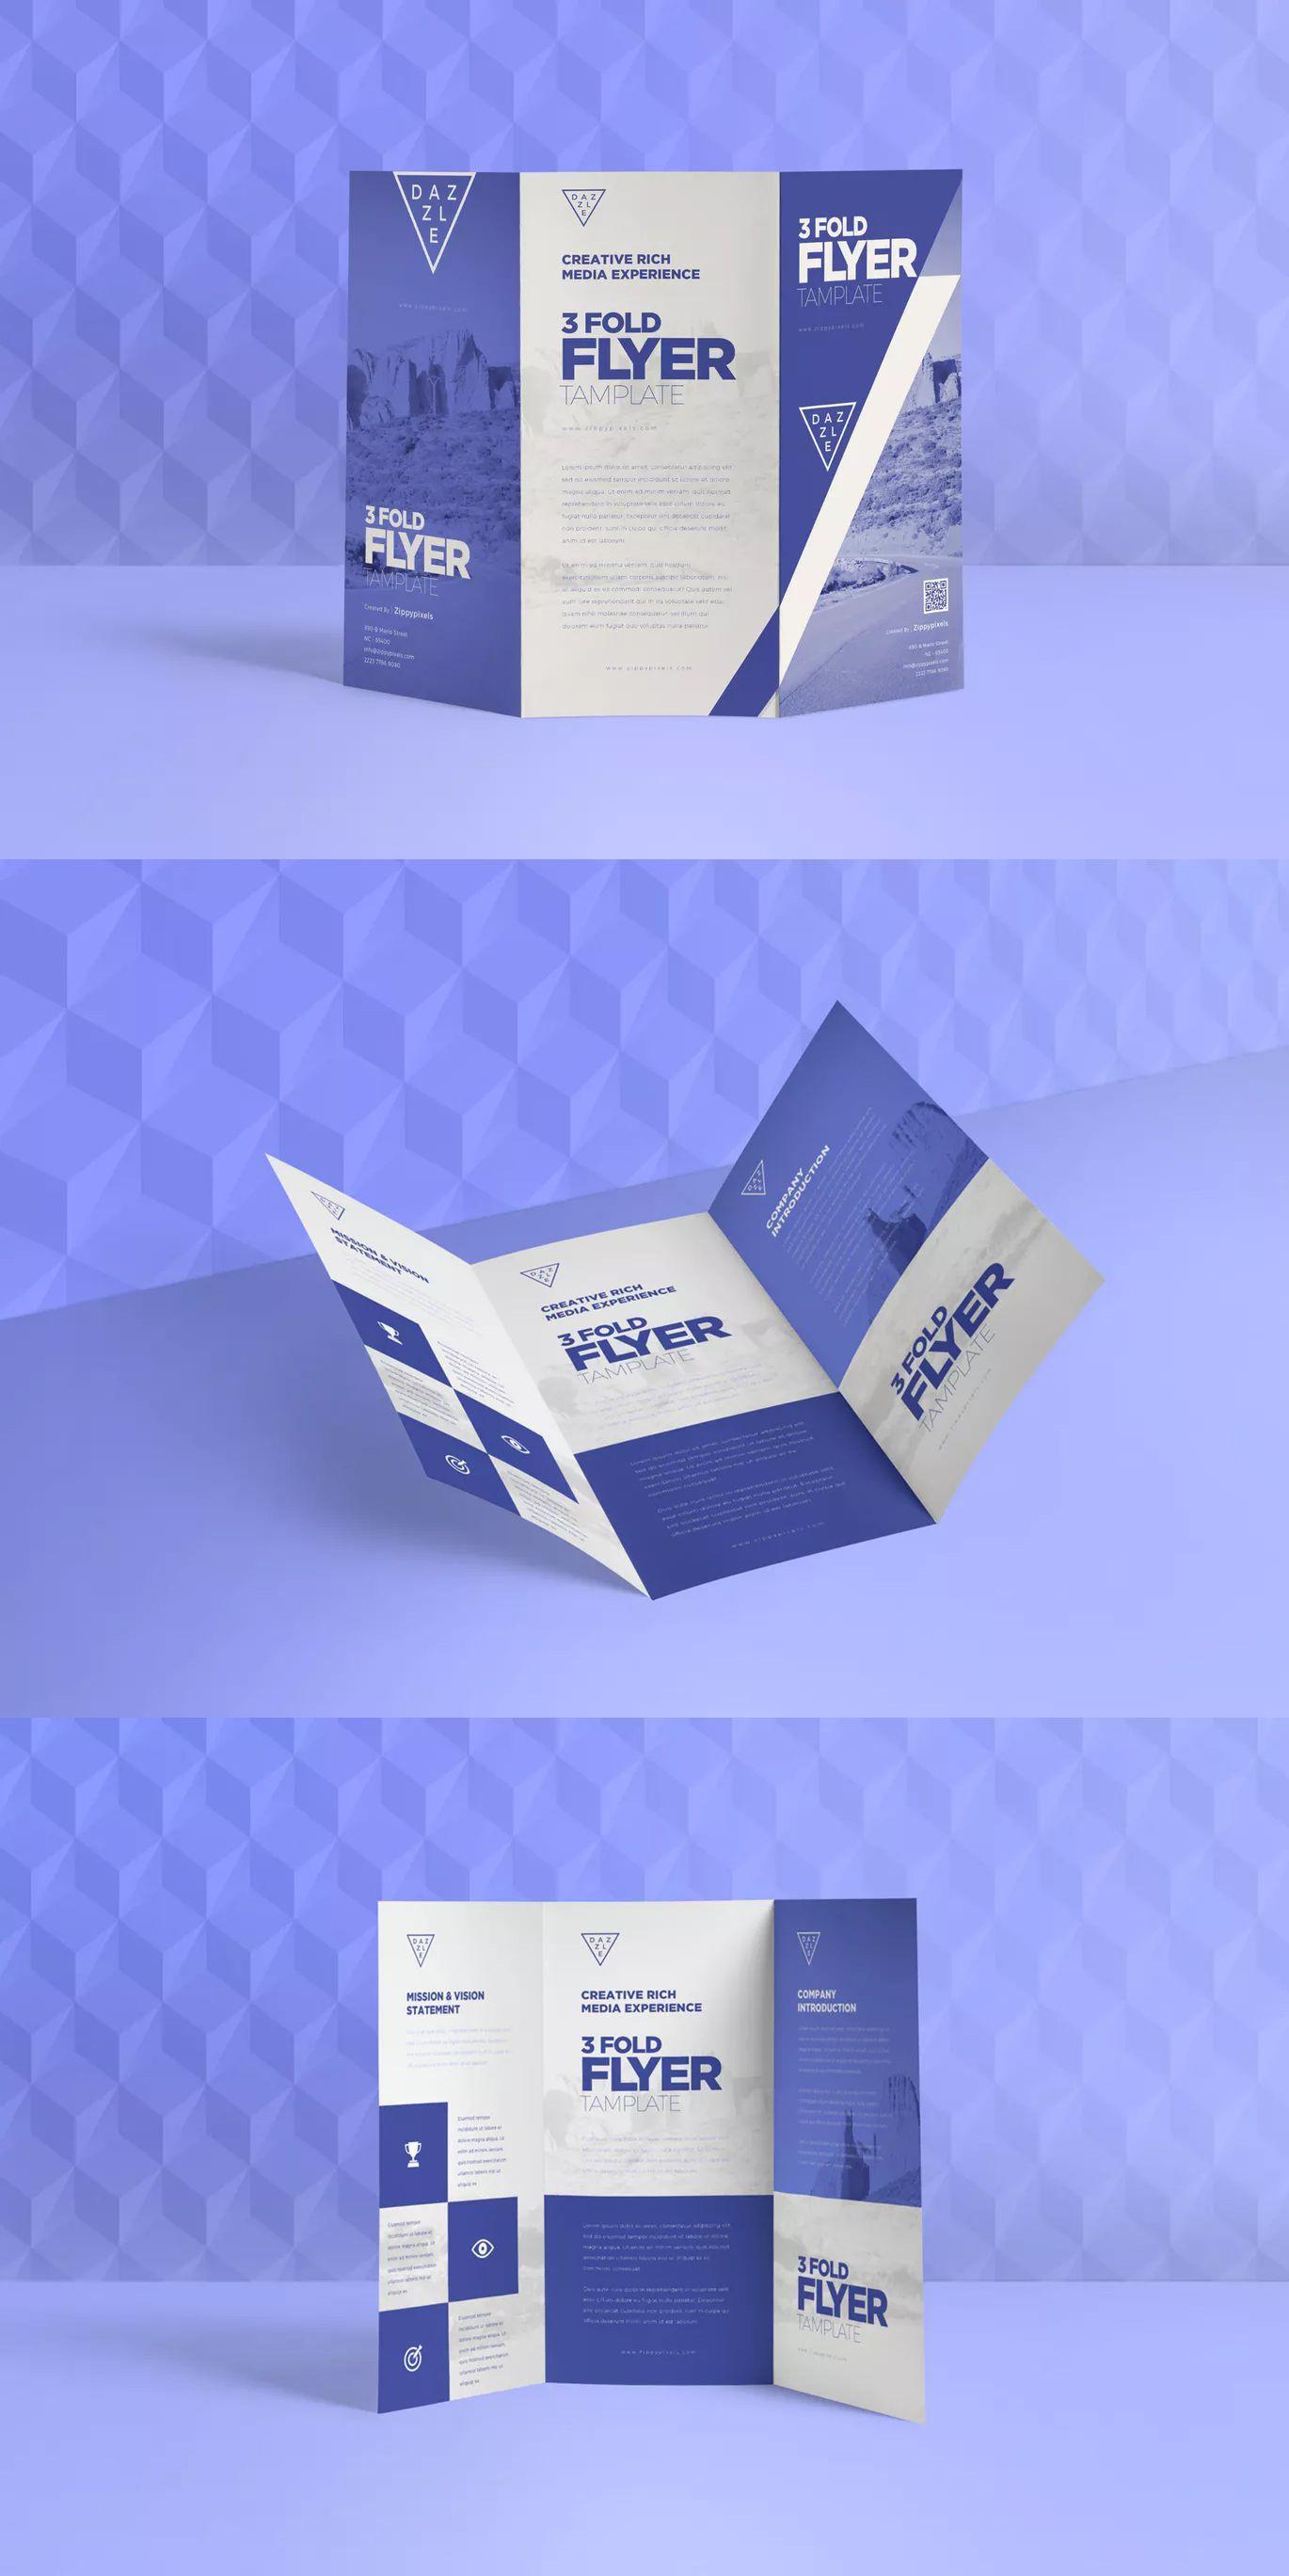 3 Fold Flyer Templates